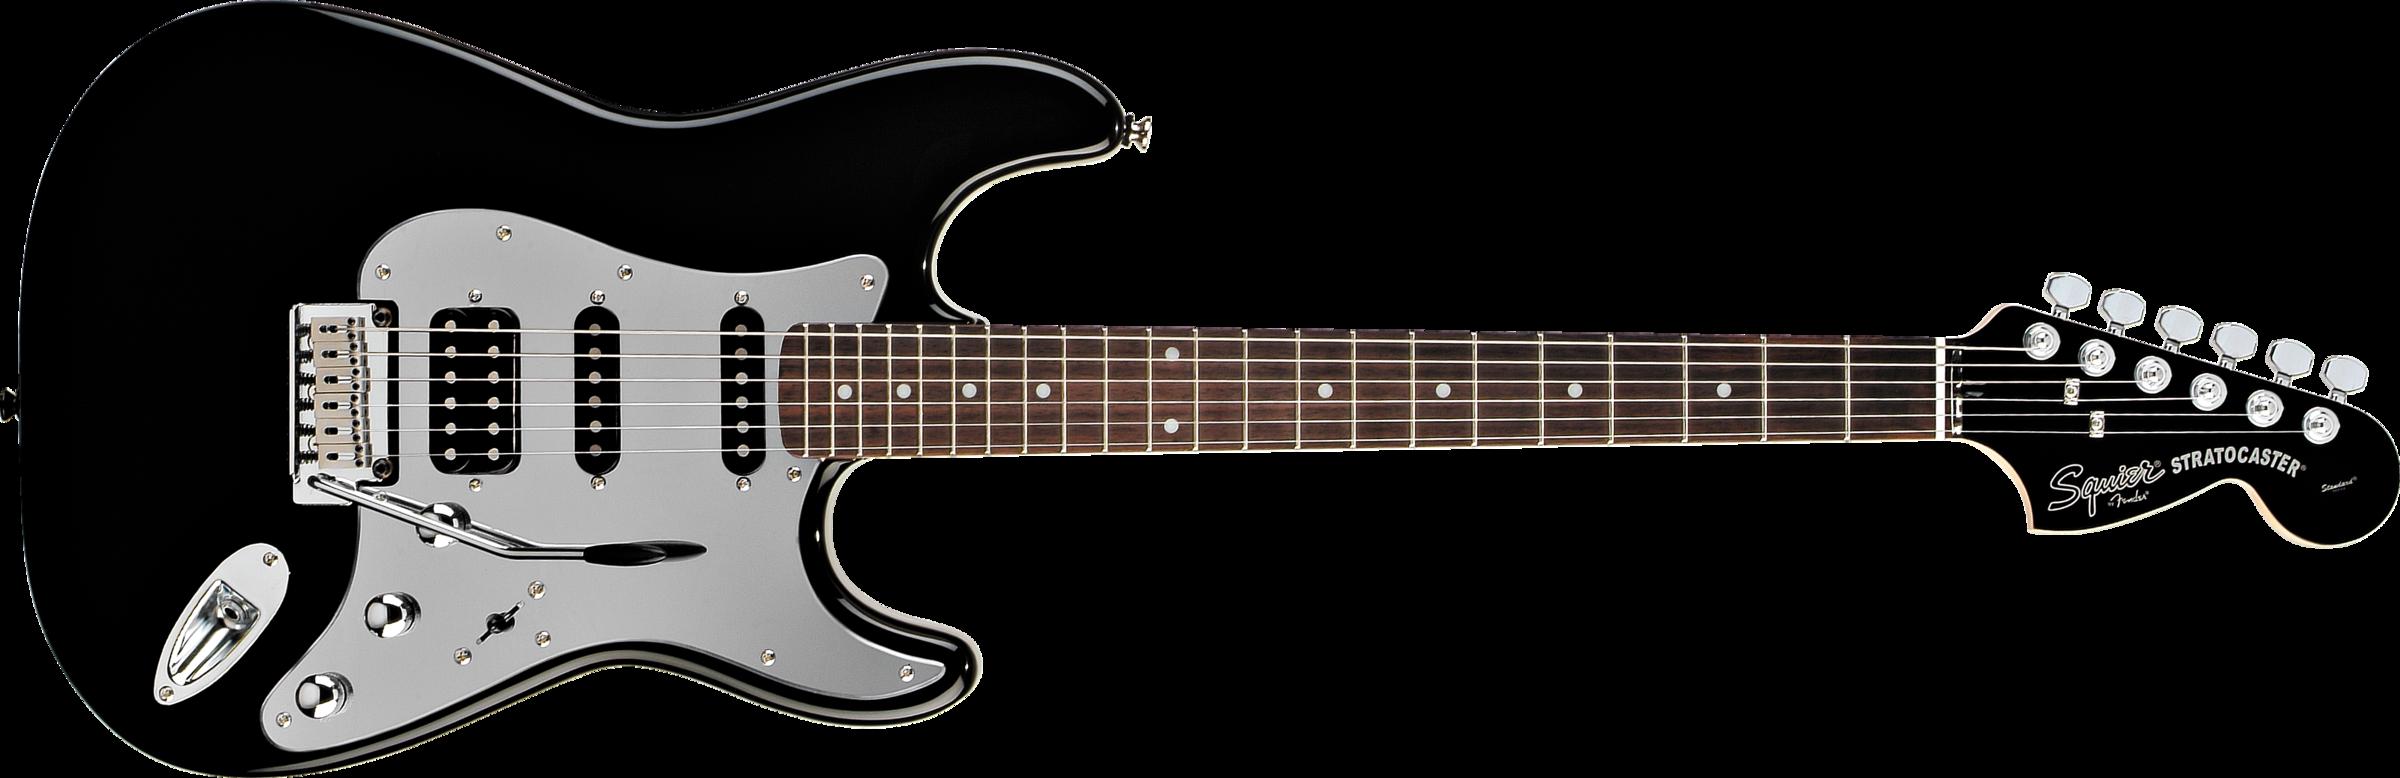 Electric Guitar Png Image Electric Guitar Guitar Acoustic Bass Guitar